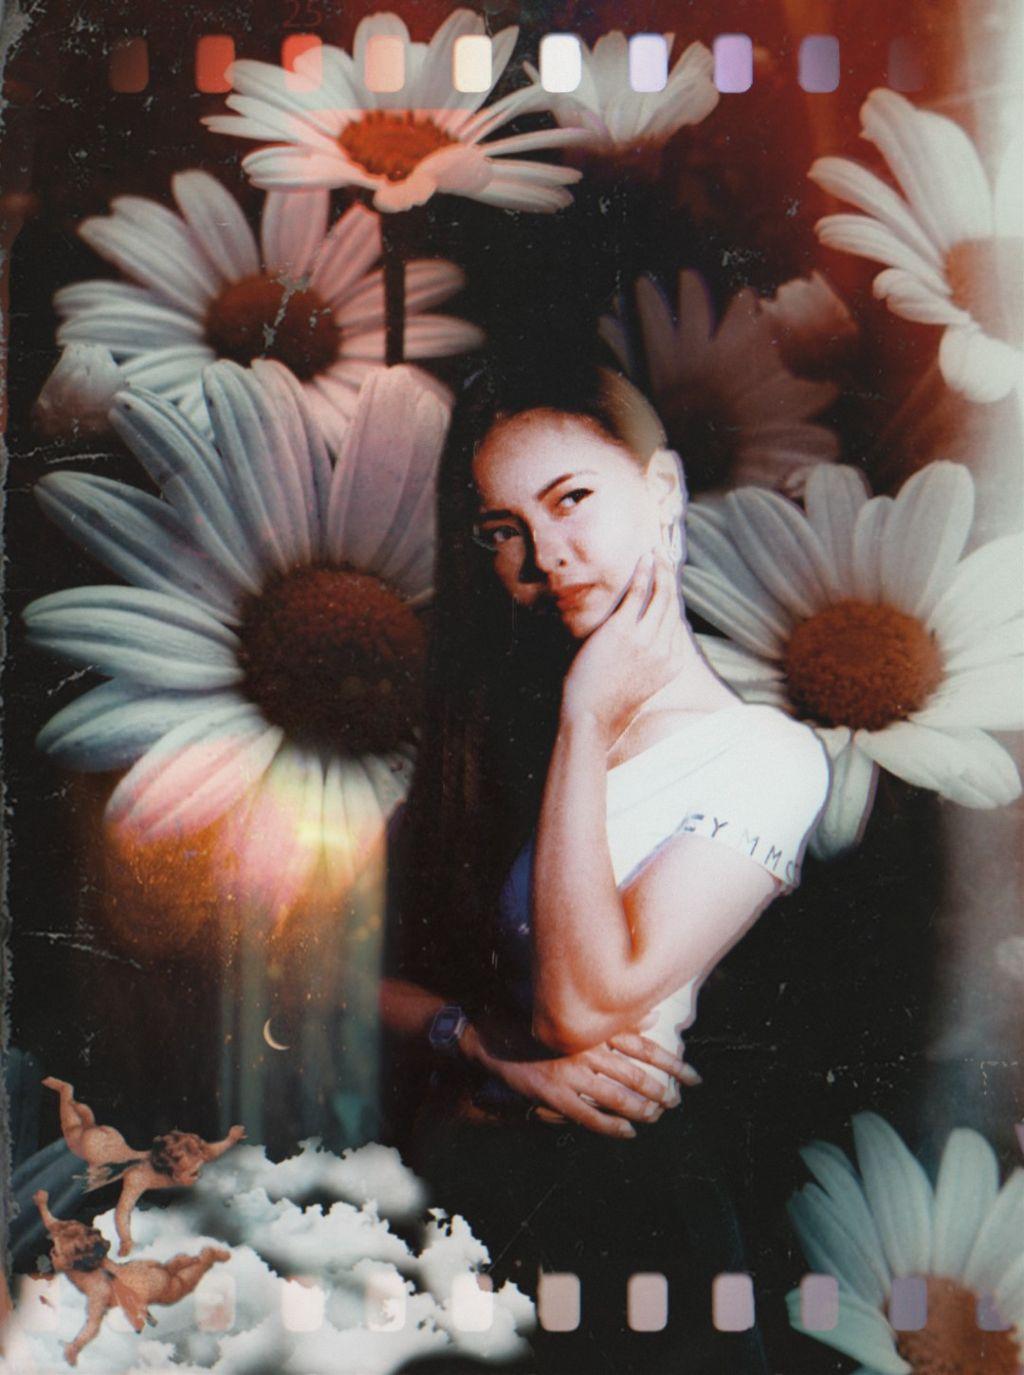 #overlay #heypicsart #myedit #portrait #cutout #girl #woman #flowers #be_creative #creativity #beautiful #aesthetic #artisticedit #oldeffect #inspiration #myremixedit #madewithpicsart #edits #picsart @picsart